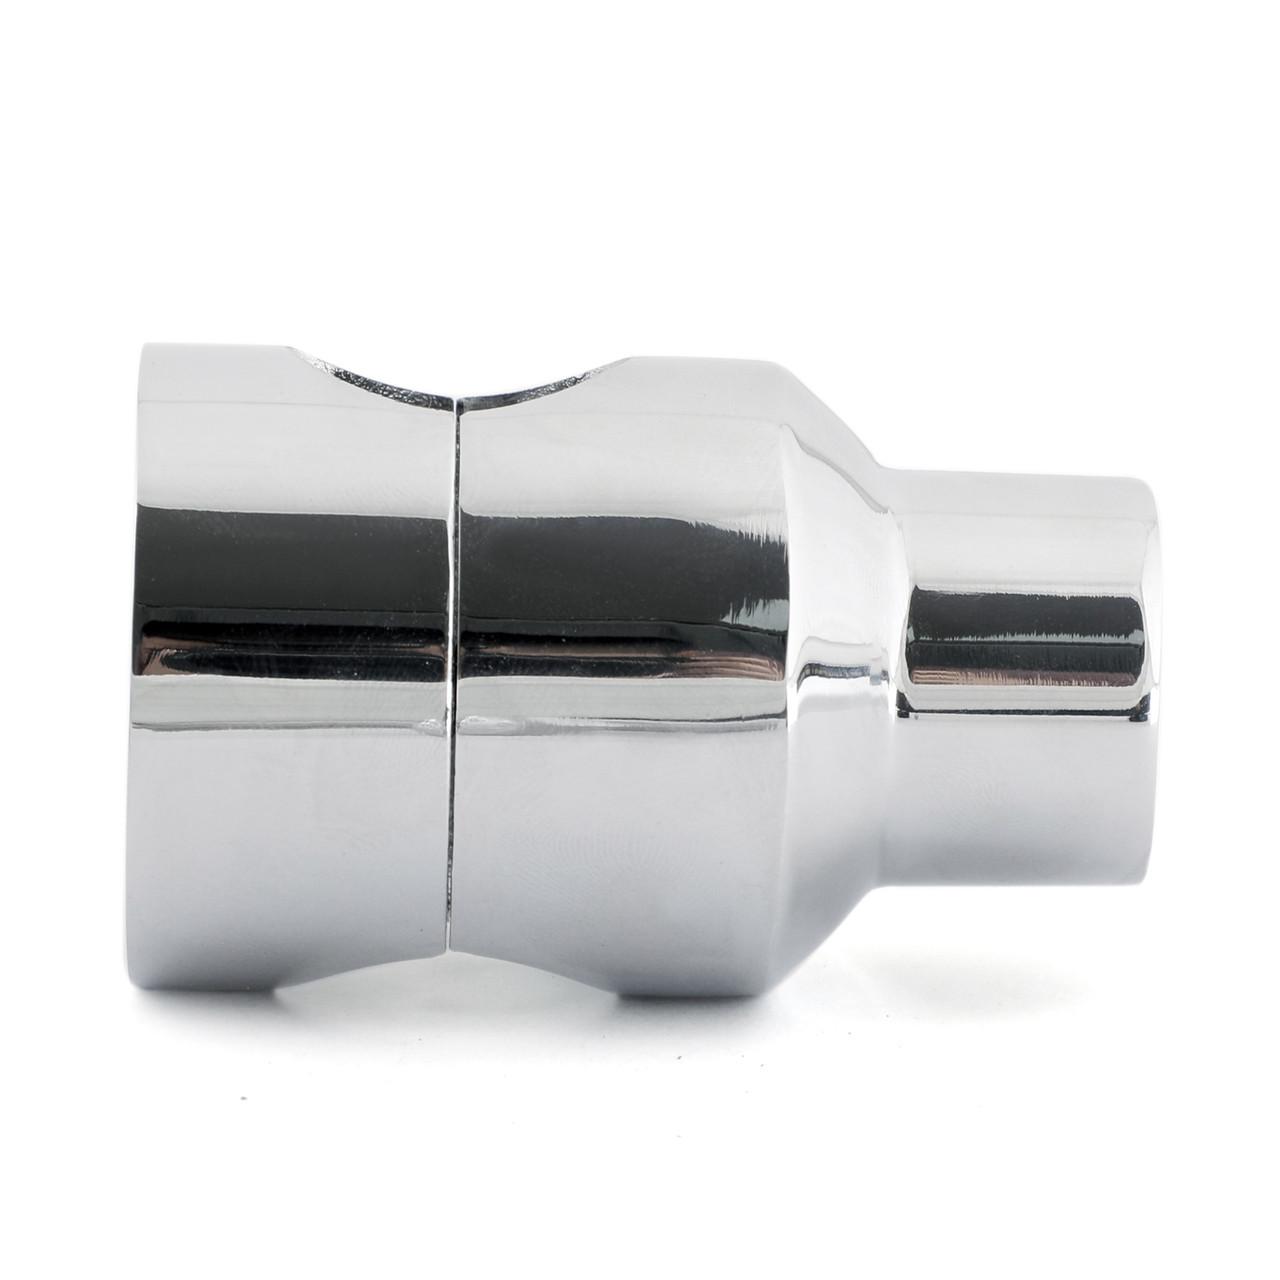 "2"" Handlebar Risers Chrome Billet (Universal Fit to 1"" Handlebar) Round"